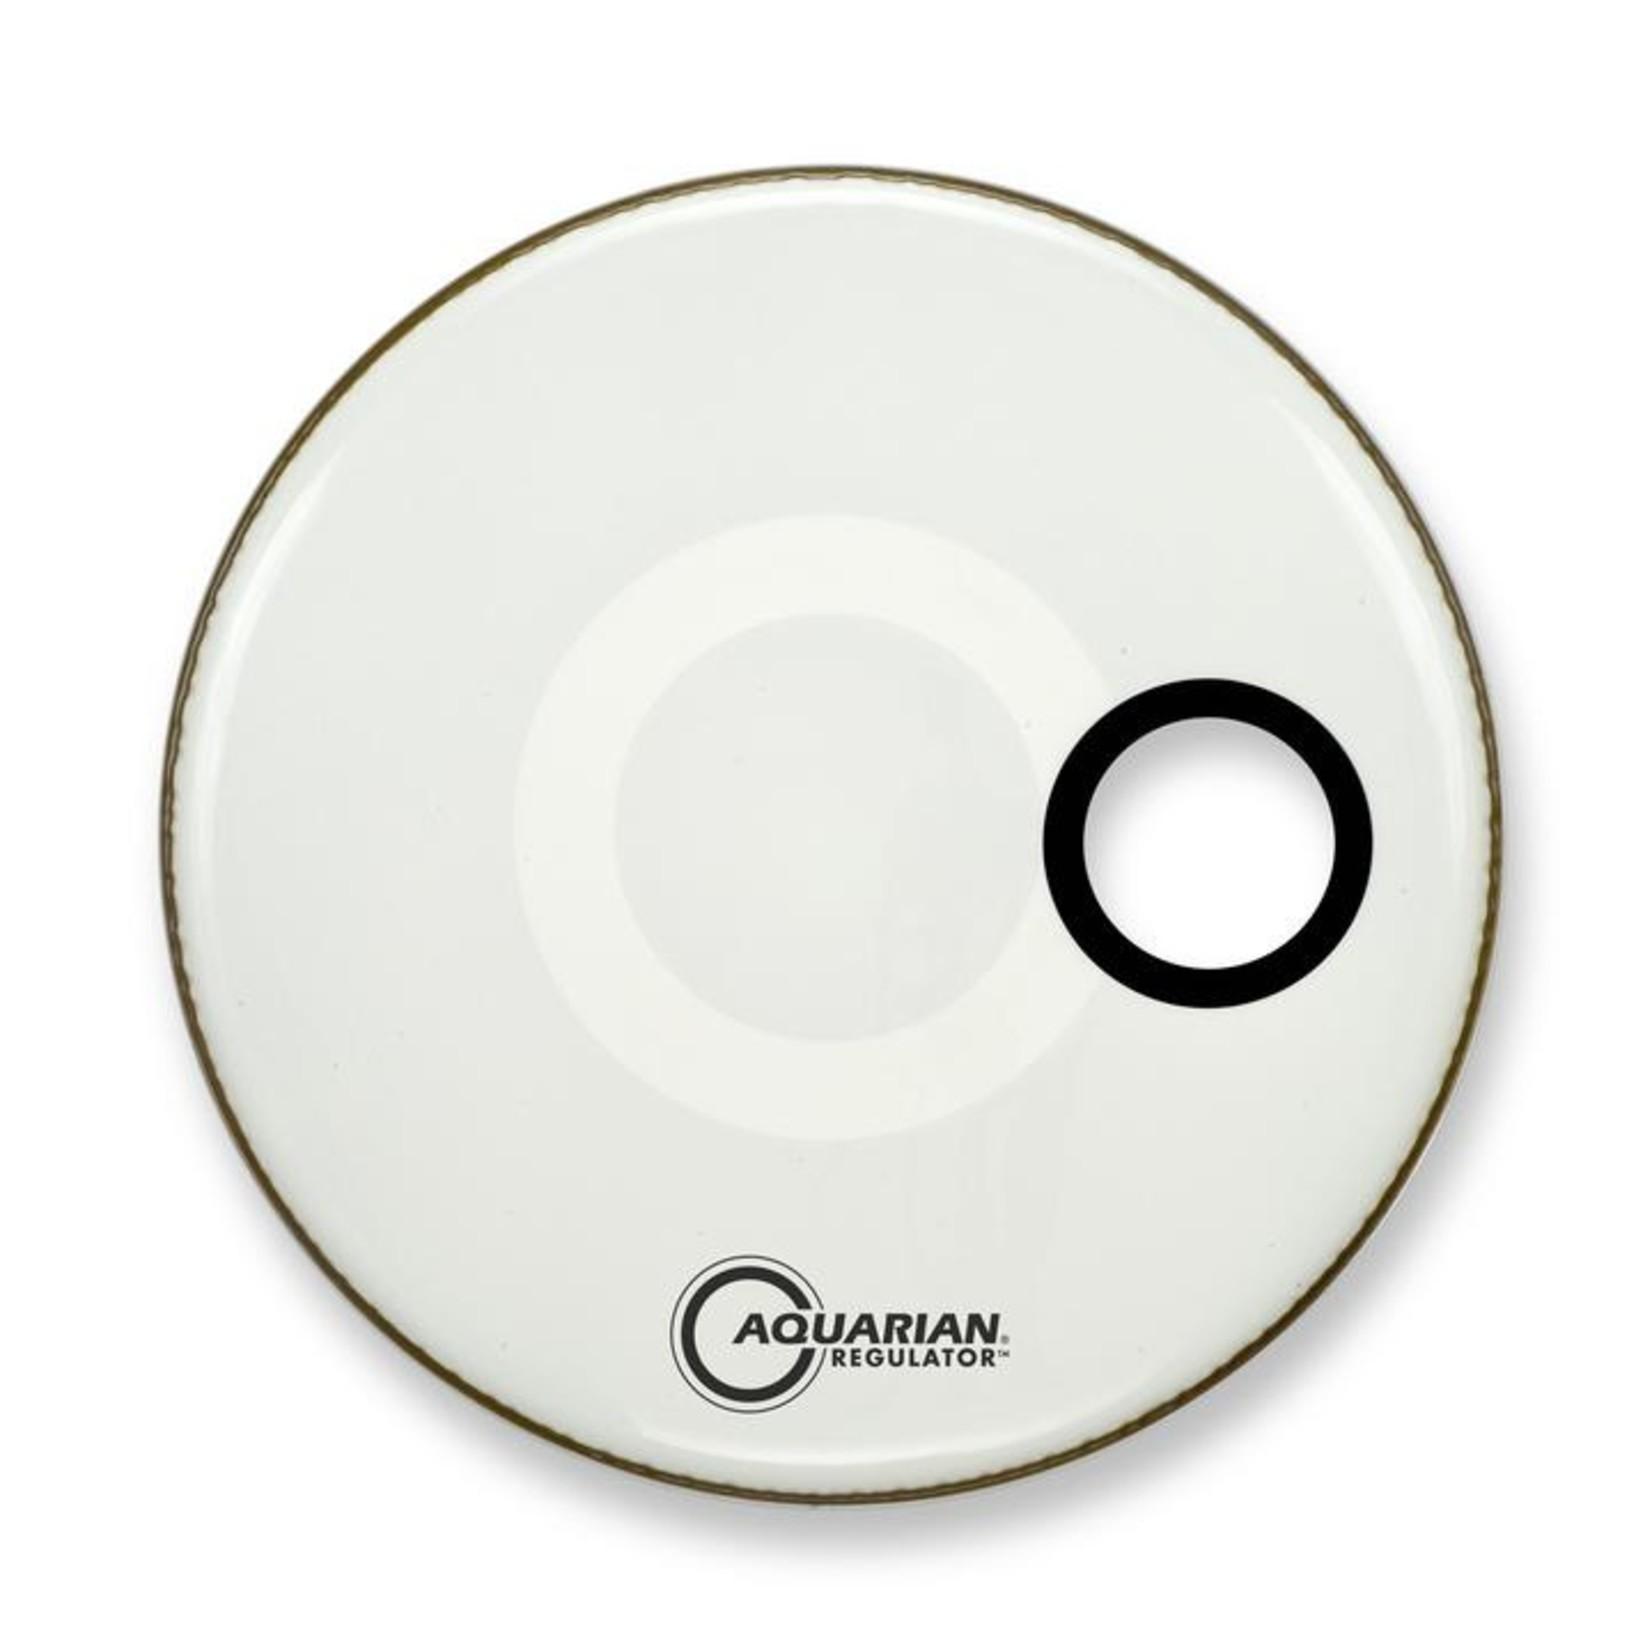 "Aquarian Aquarian Regulator White Video Gloss Bass Drum w/ 4.75"" Offset Hole"